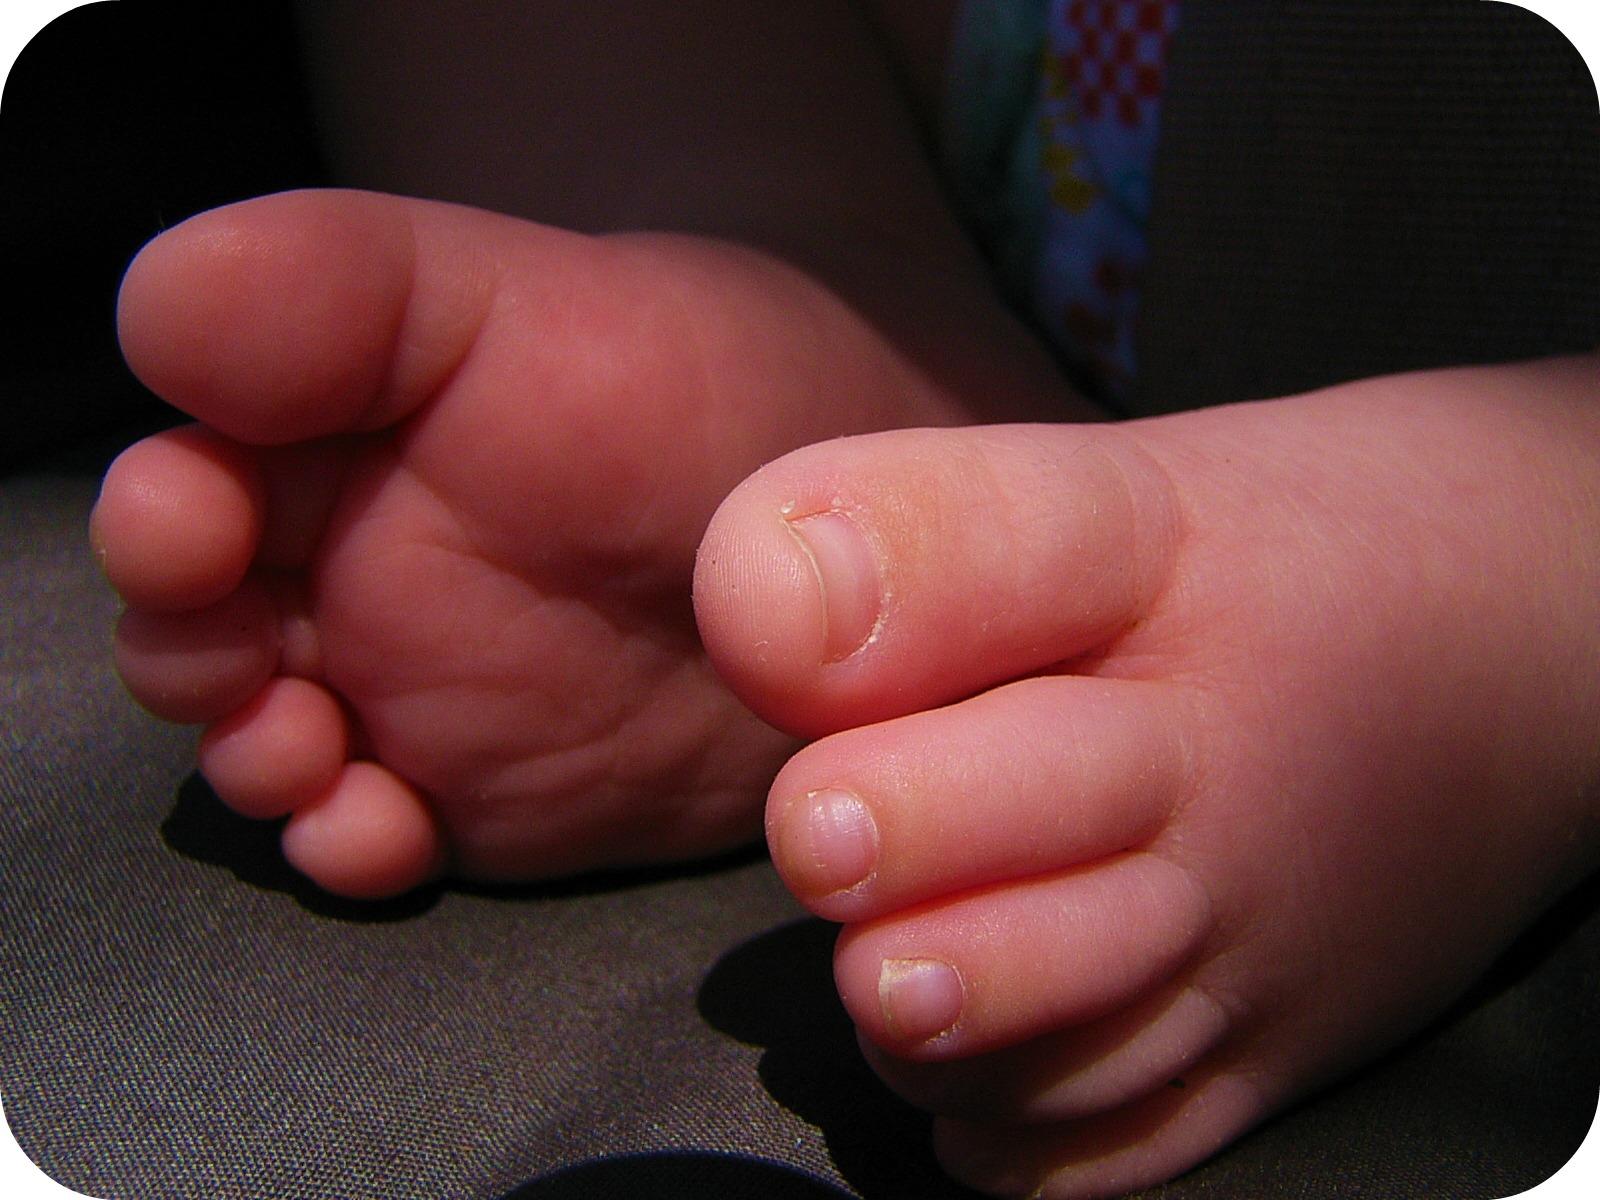 Baby feet - rgbstock.com